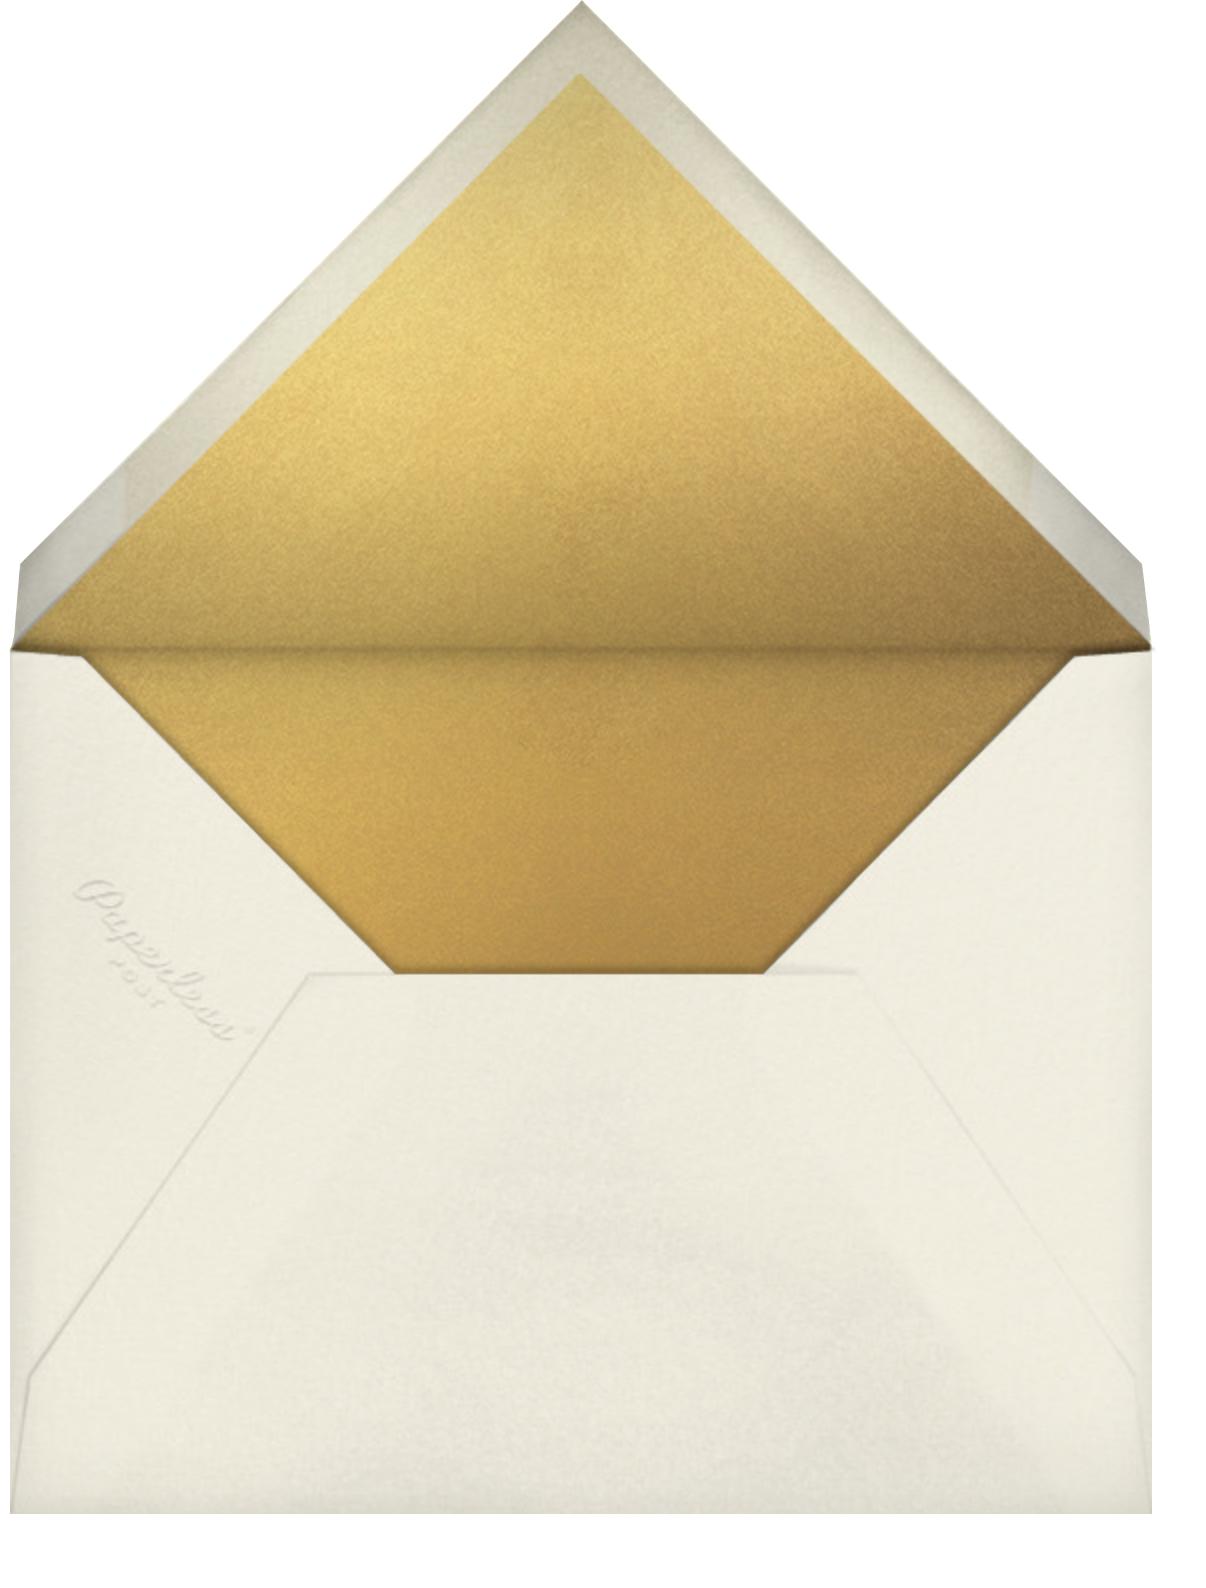 Big Things - Paperless Post - Graduation - envelope back